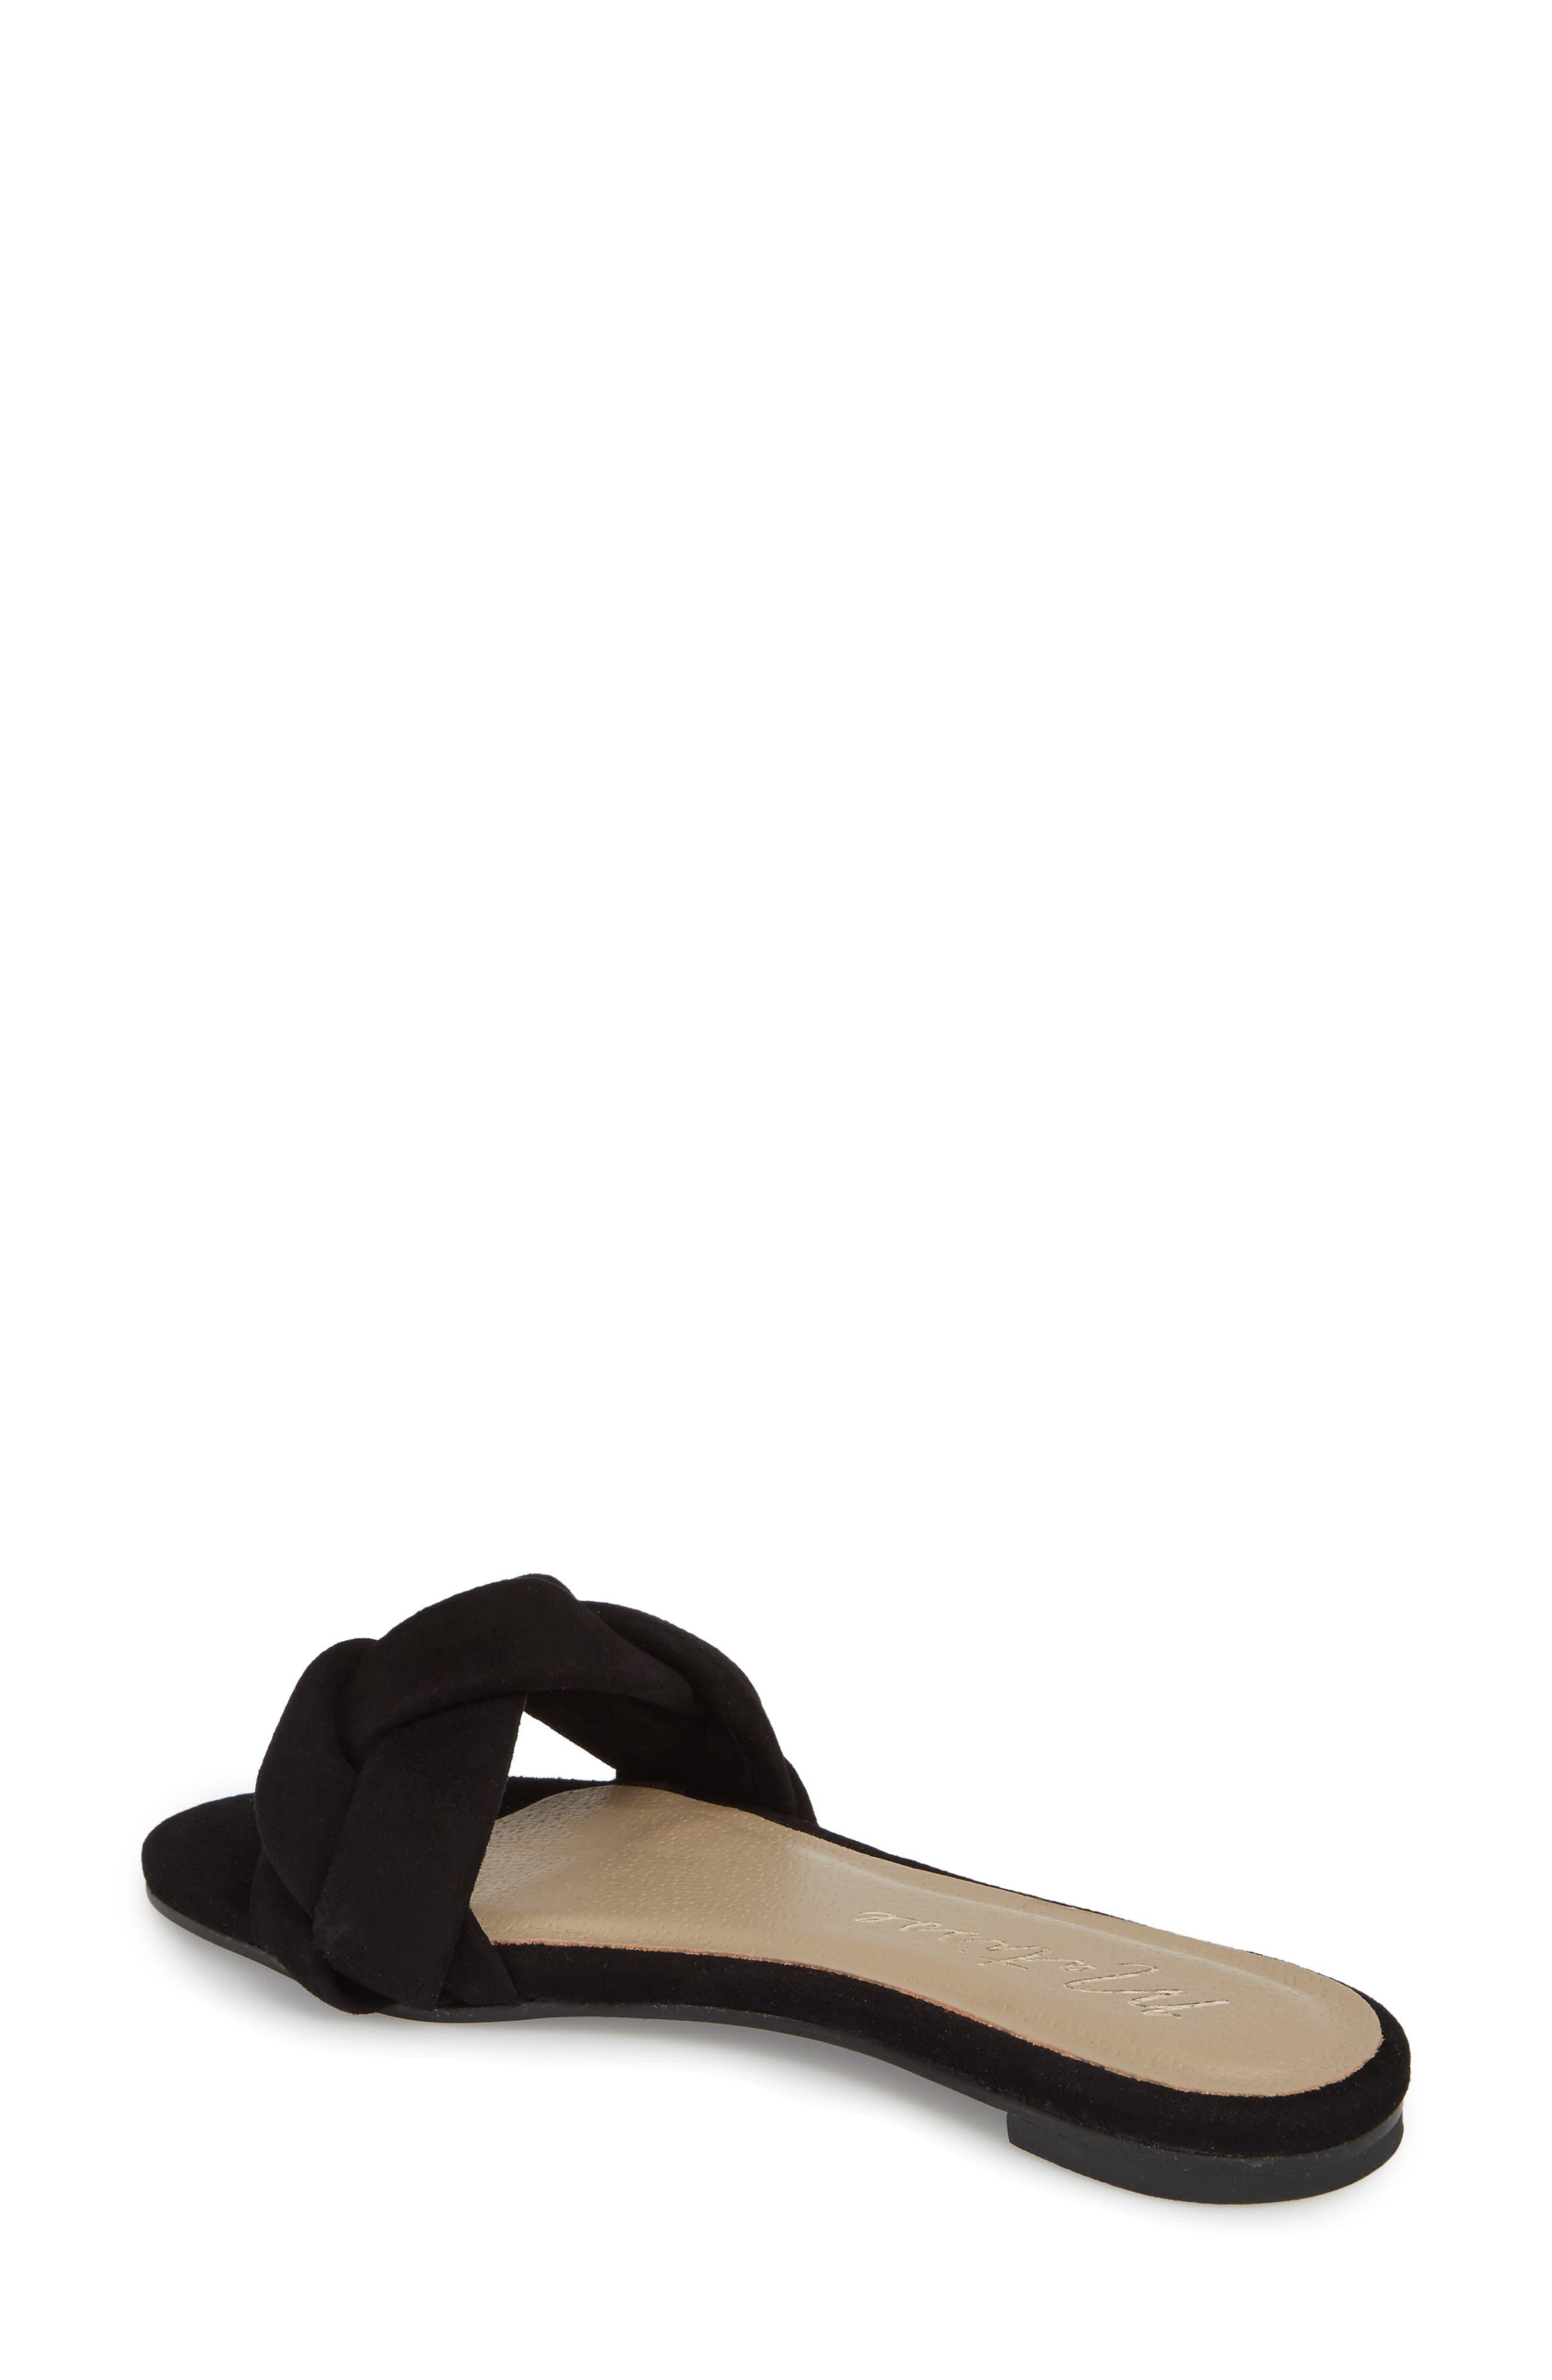 Georgie Slide Sandal,                             Alternate thumbnail 2, color,                             BLACK SUEDE